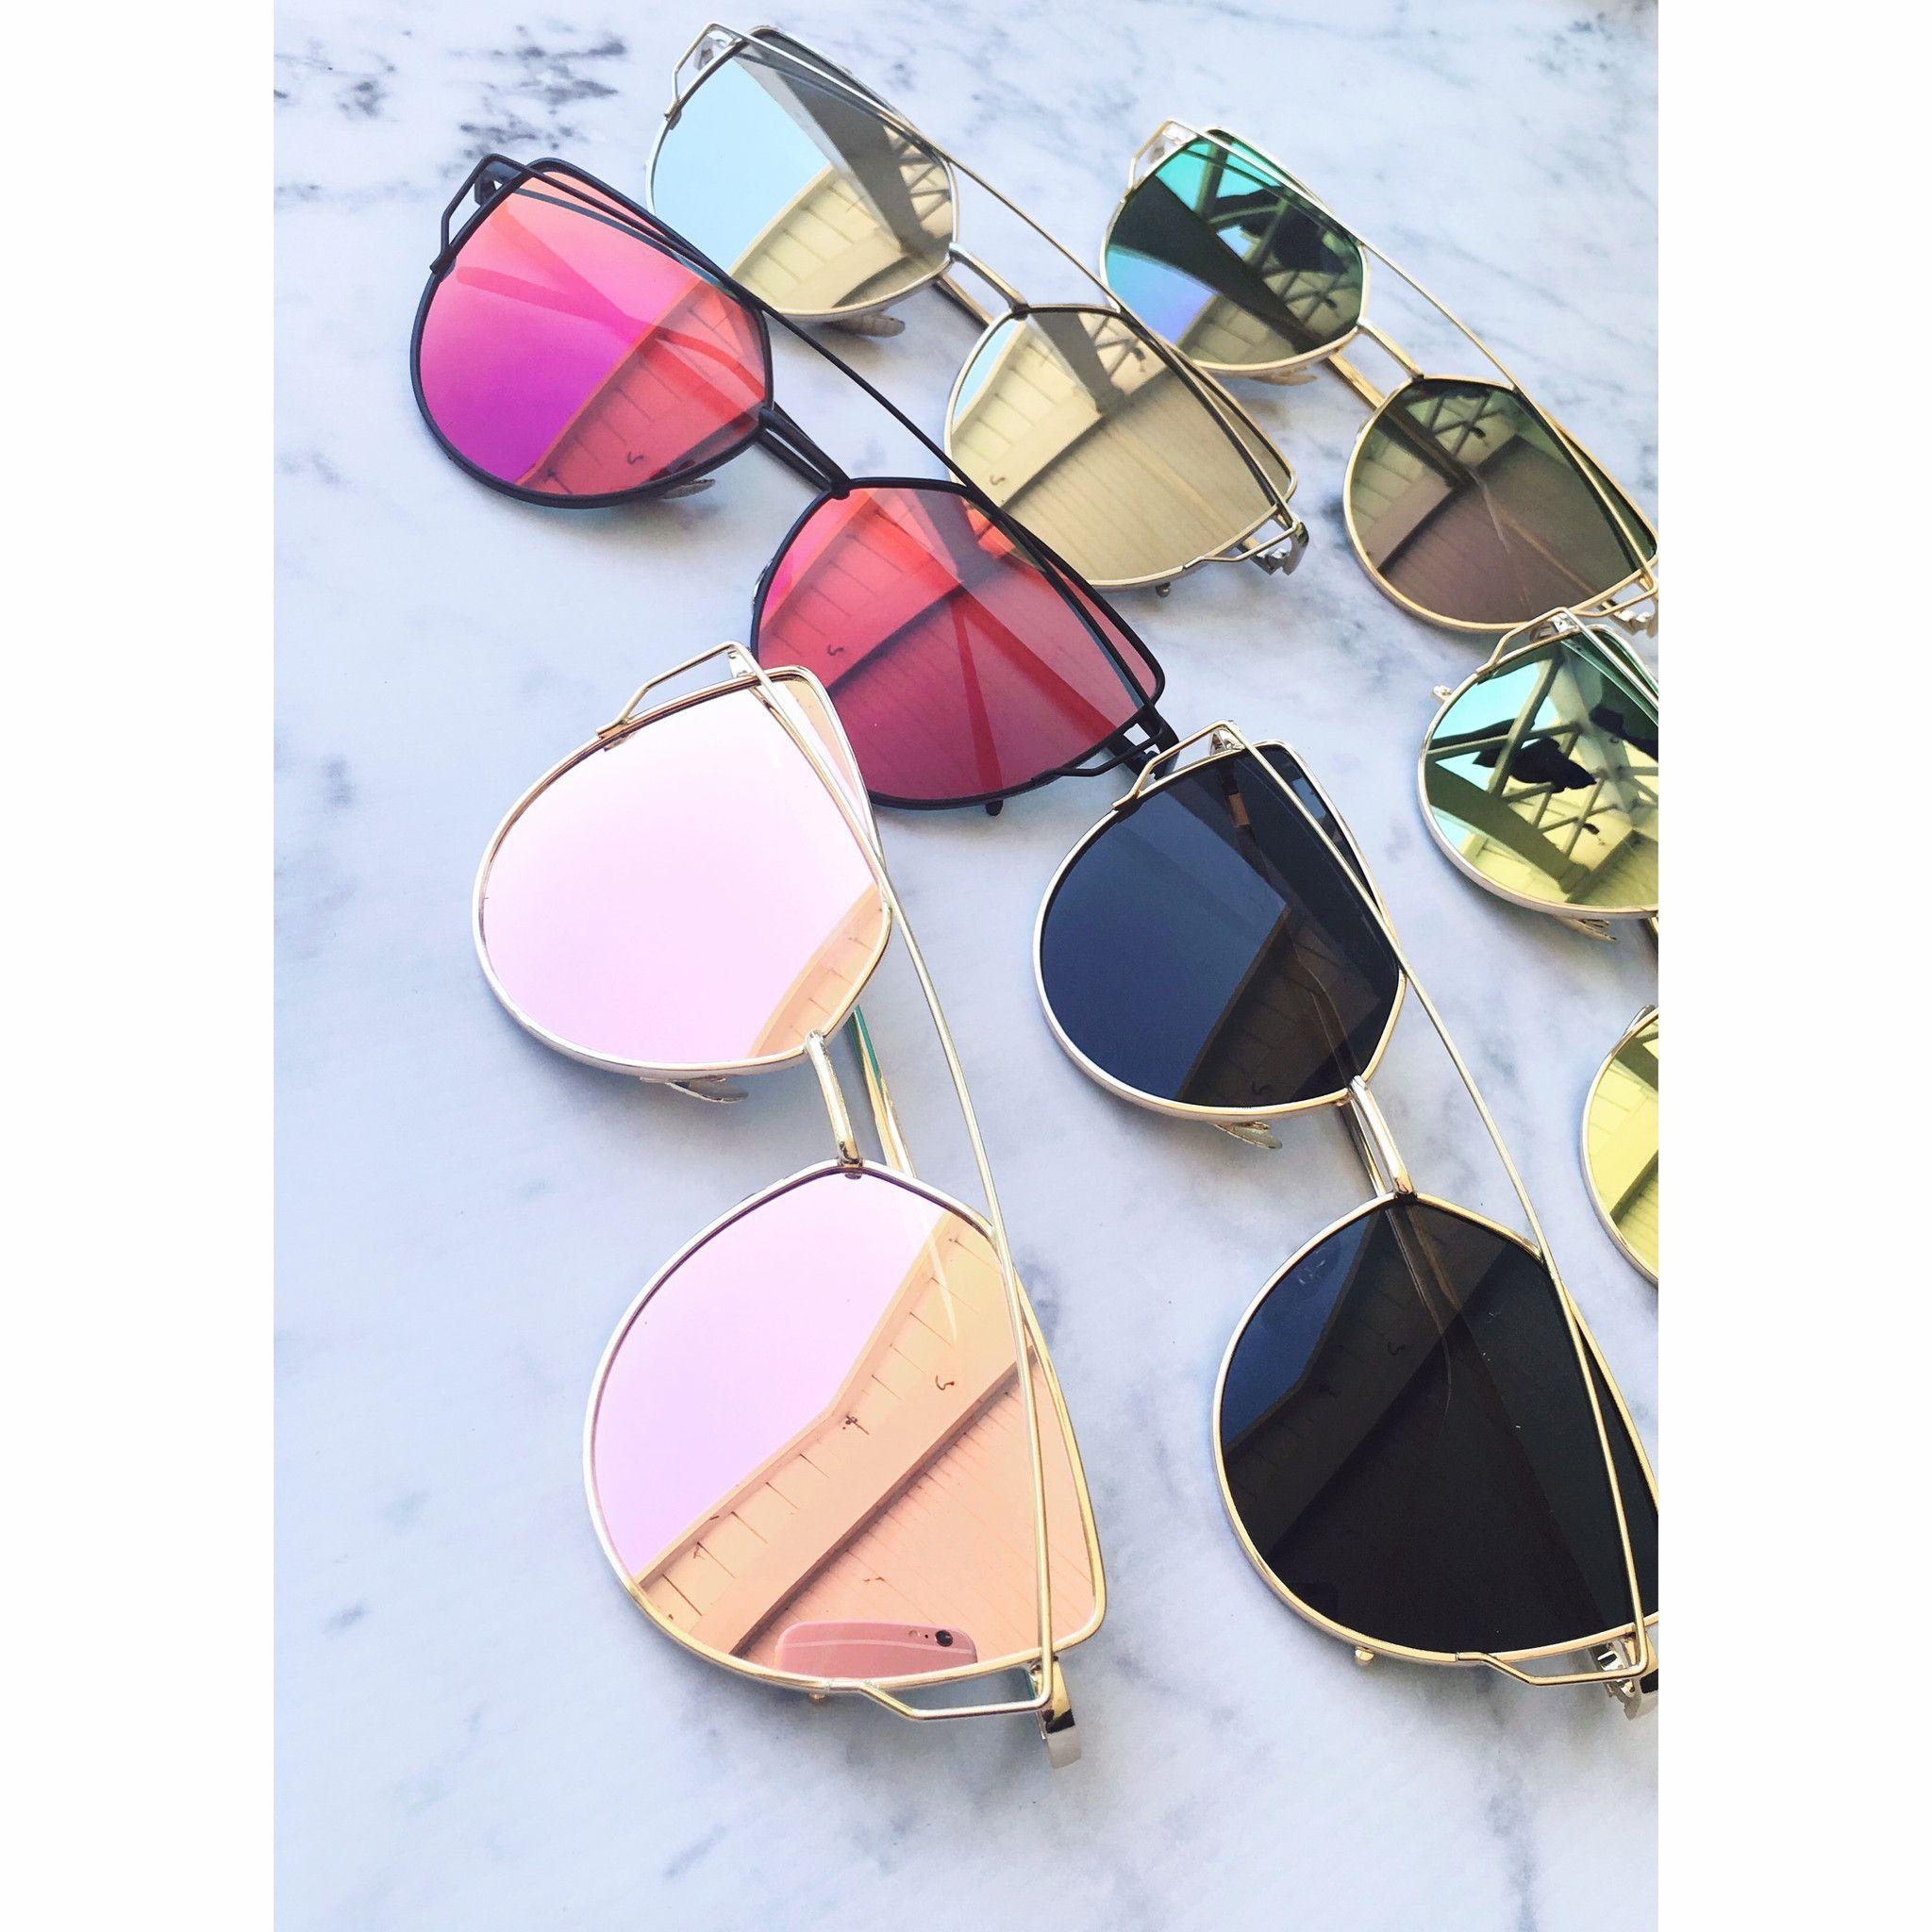 Follow for more interest pins pinterest    princessk Sunglasses Women,  Retro Sunglasses, Summer 4471205f36